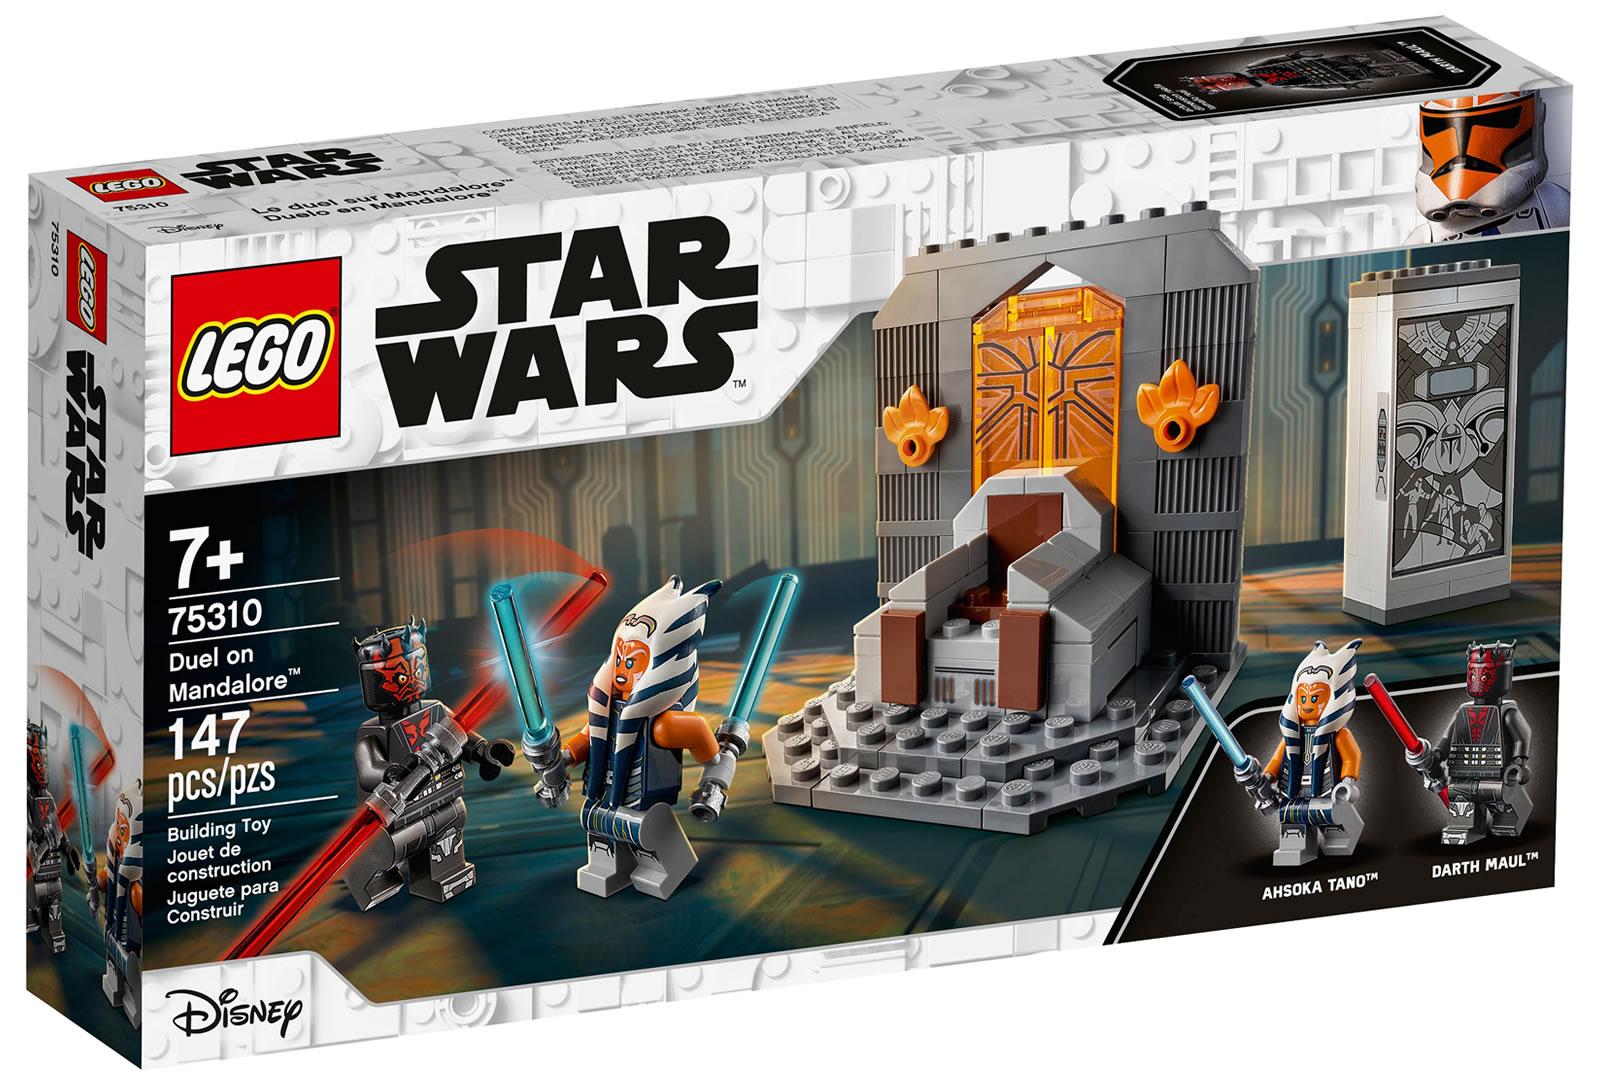 LEGO Star Wars 75310 Duel on Mandalore